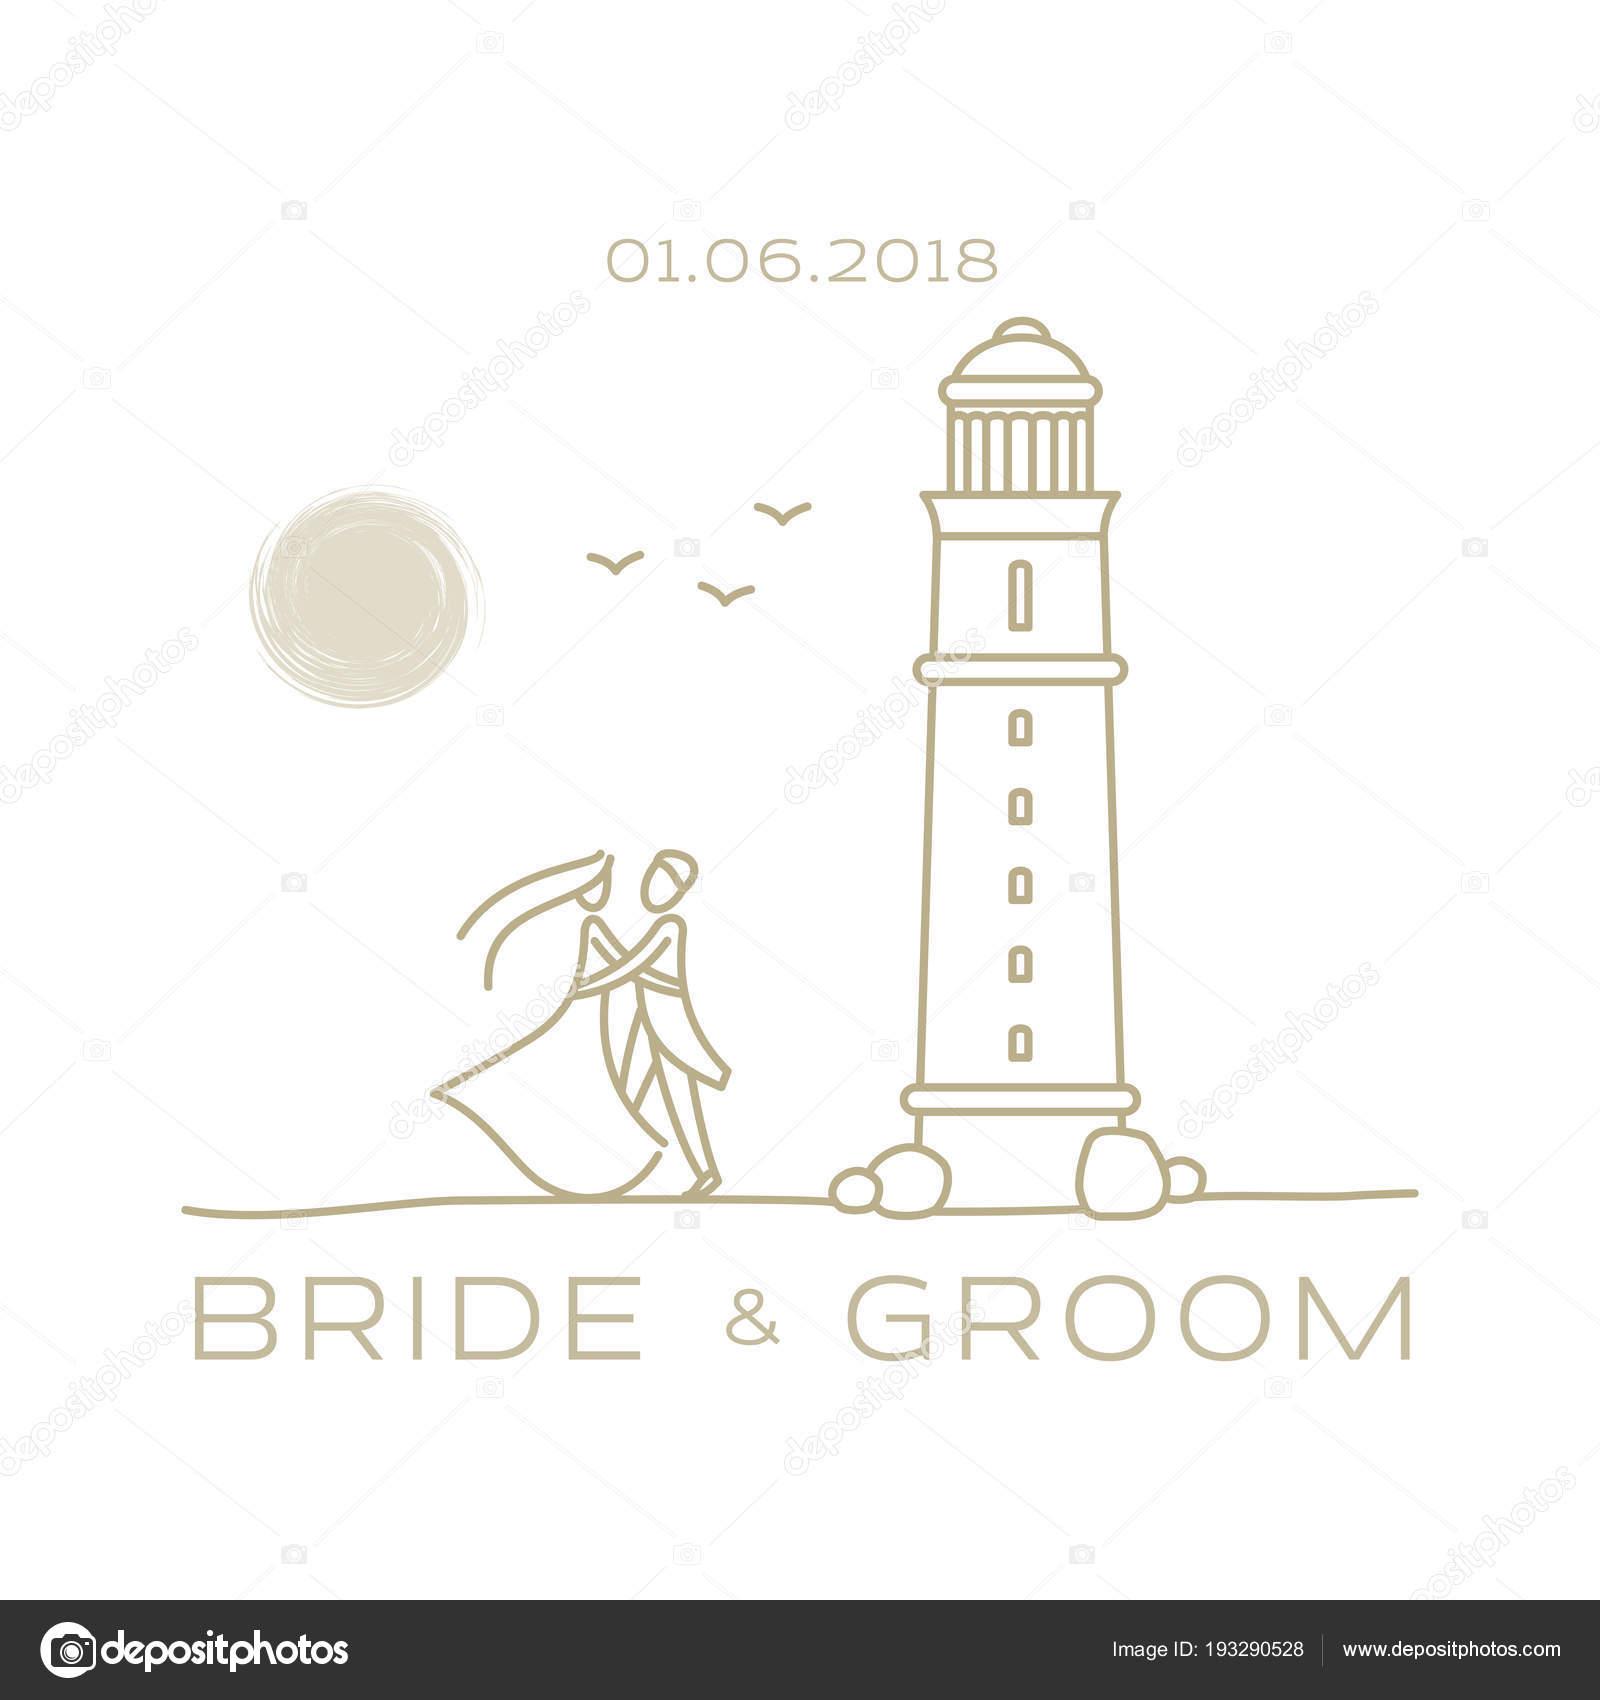 elegant design templates wedding card wedding logo business sign